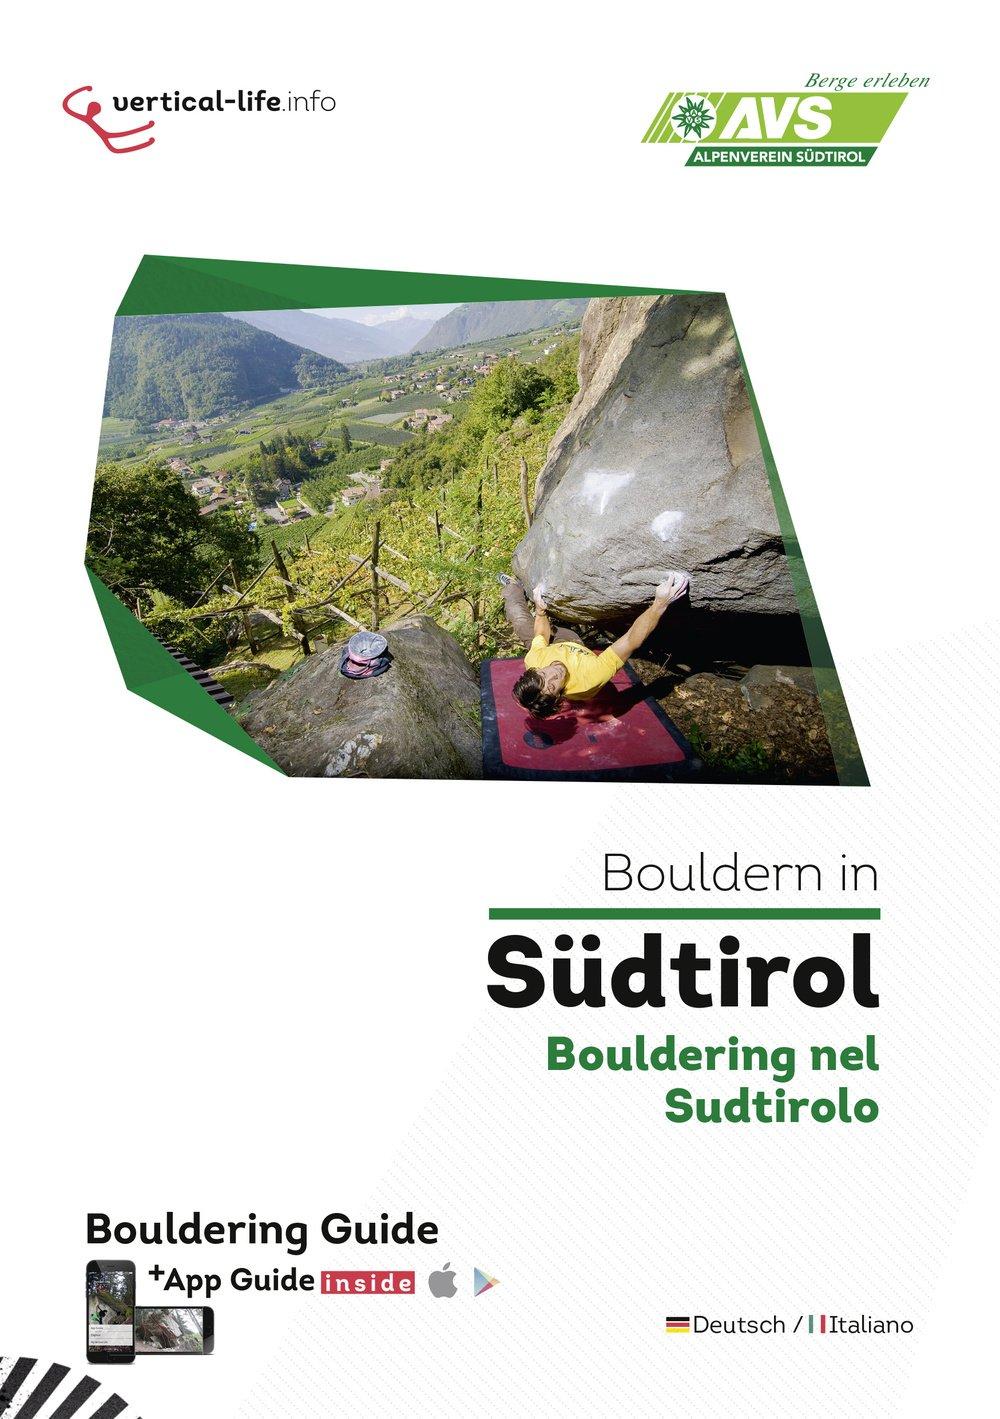 Vertical Life, Bouldern in Südtirol I AVS